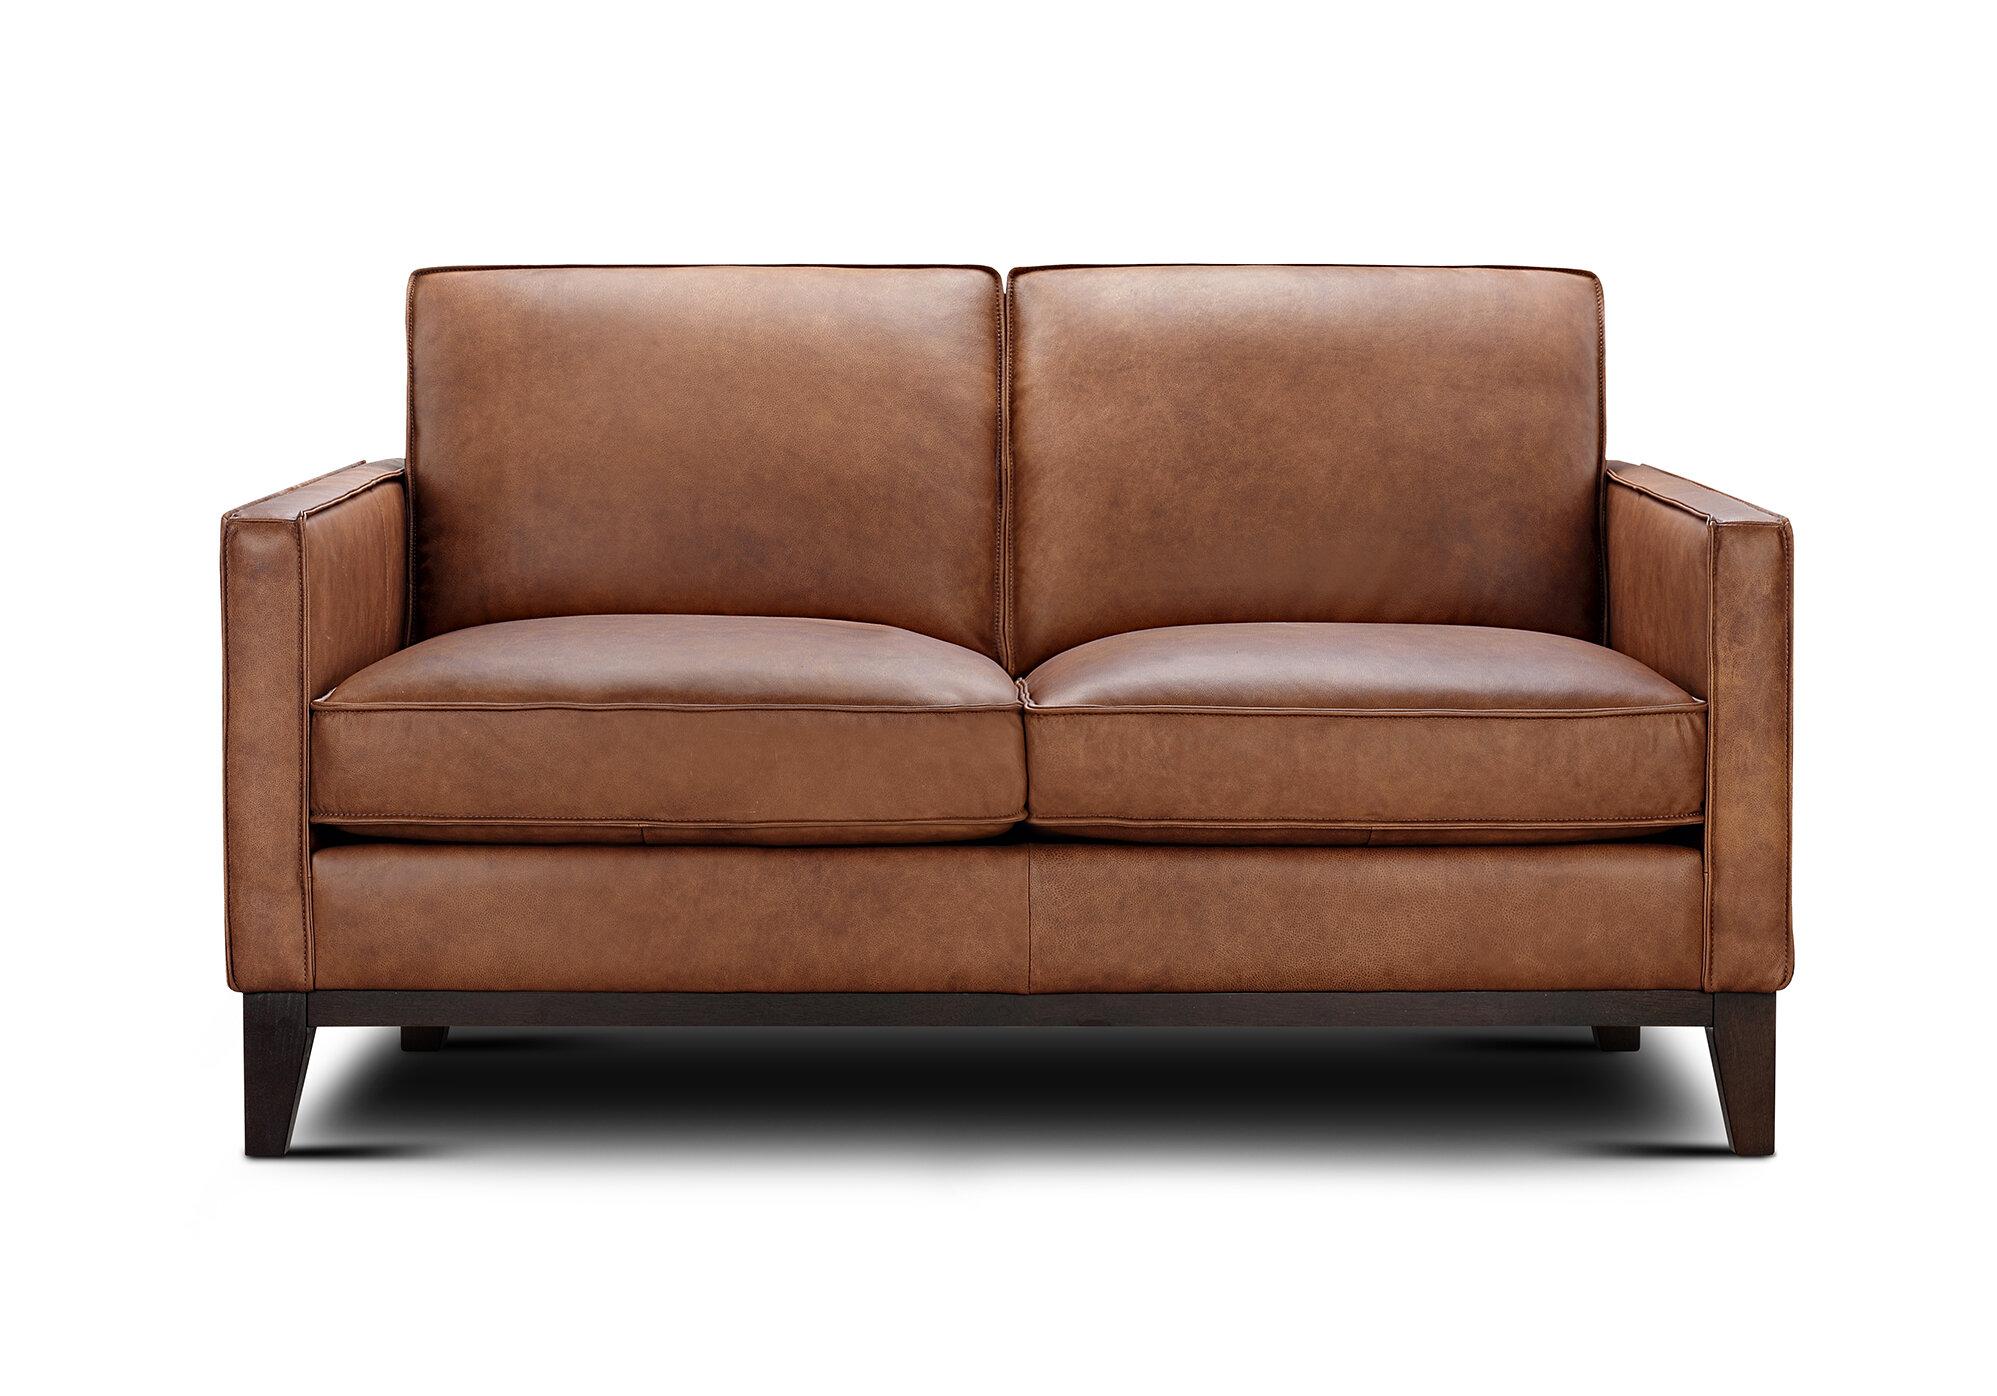 Awe Inspiring Whitson Leather Loveseat Ibusinesslaw Wood Chair Design Ideas Ibusinesslaworg